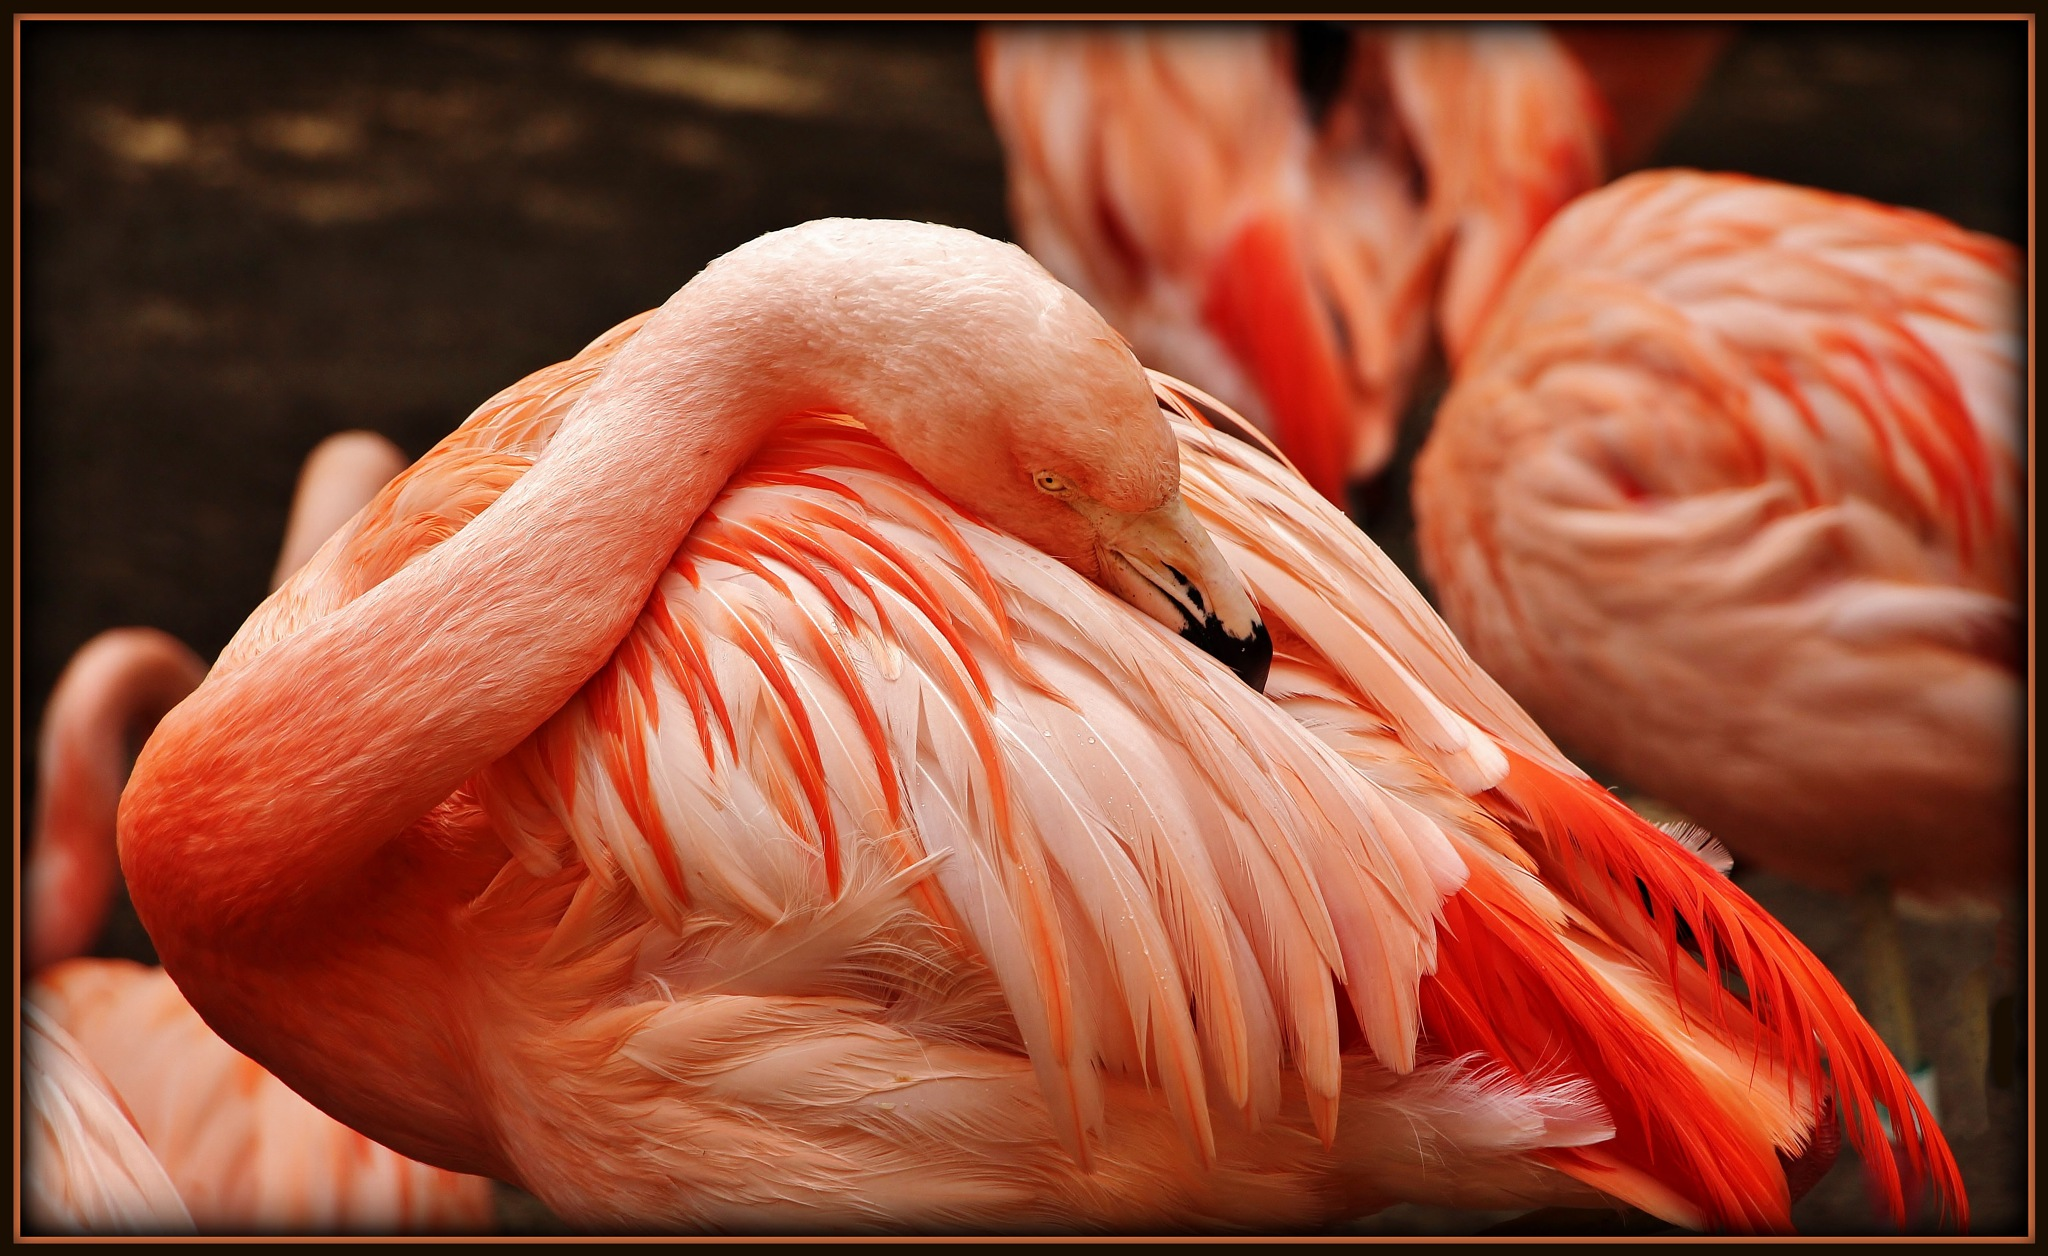 flamingo by suhad chahla